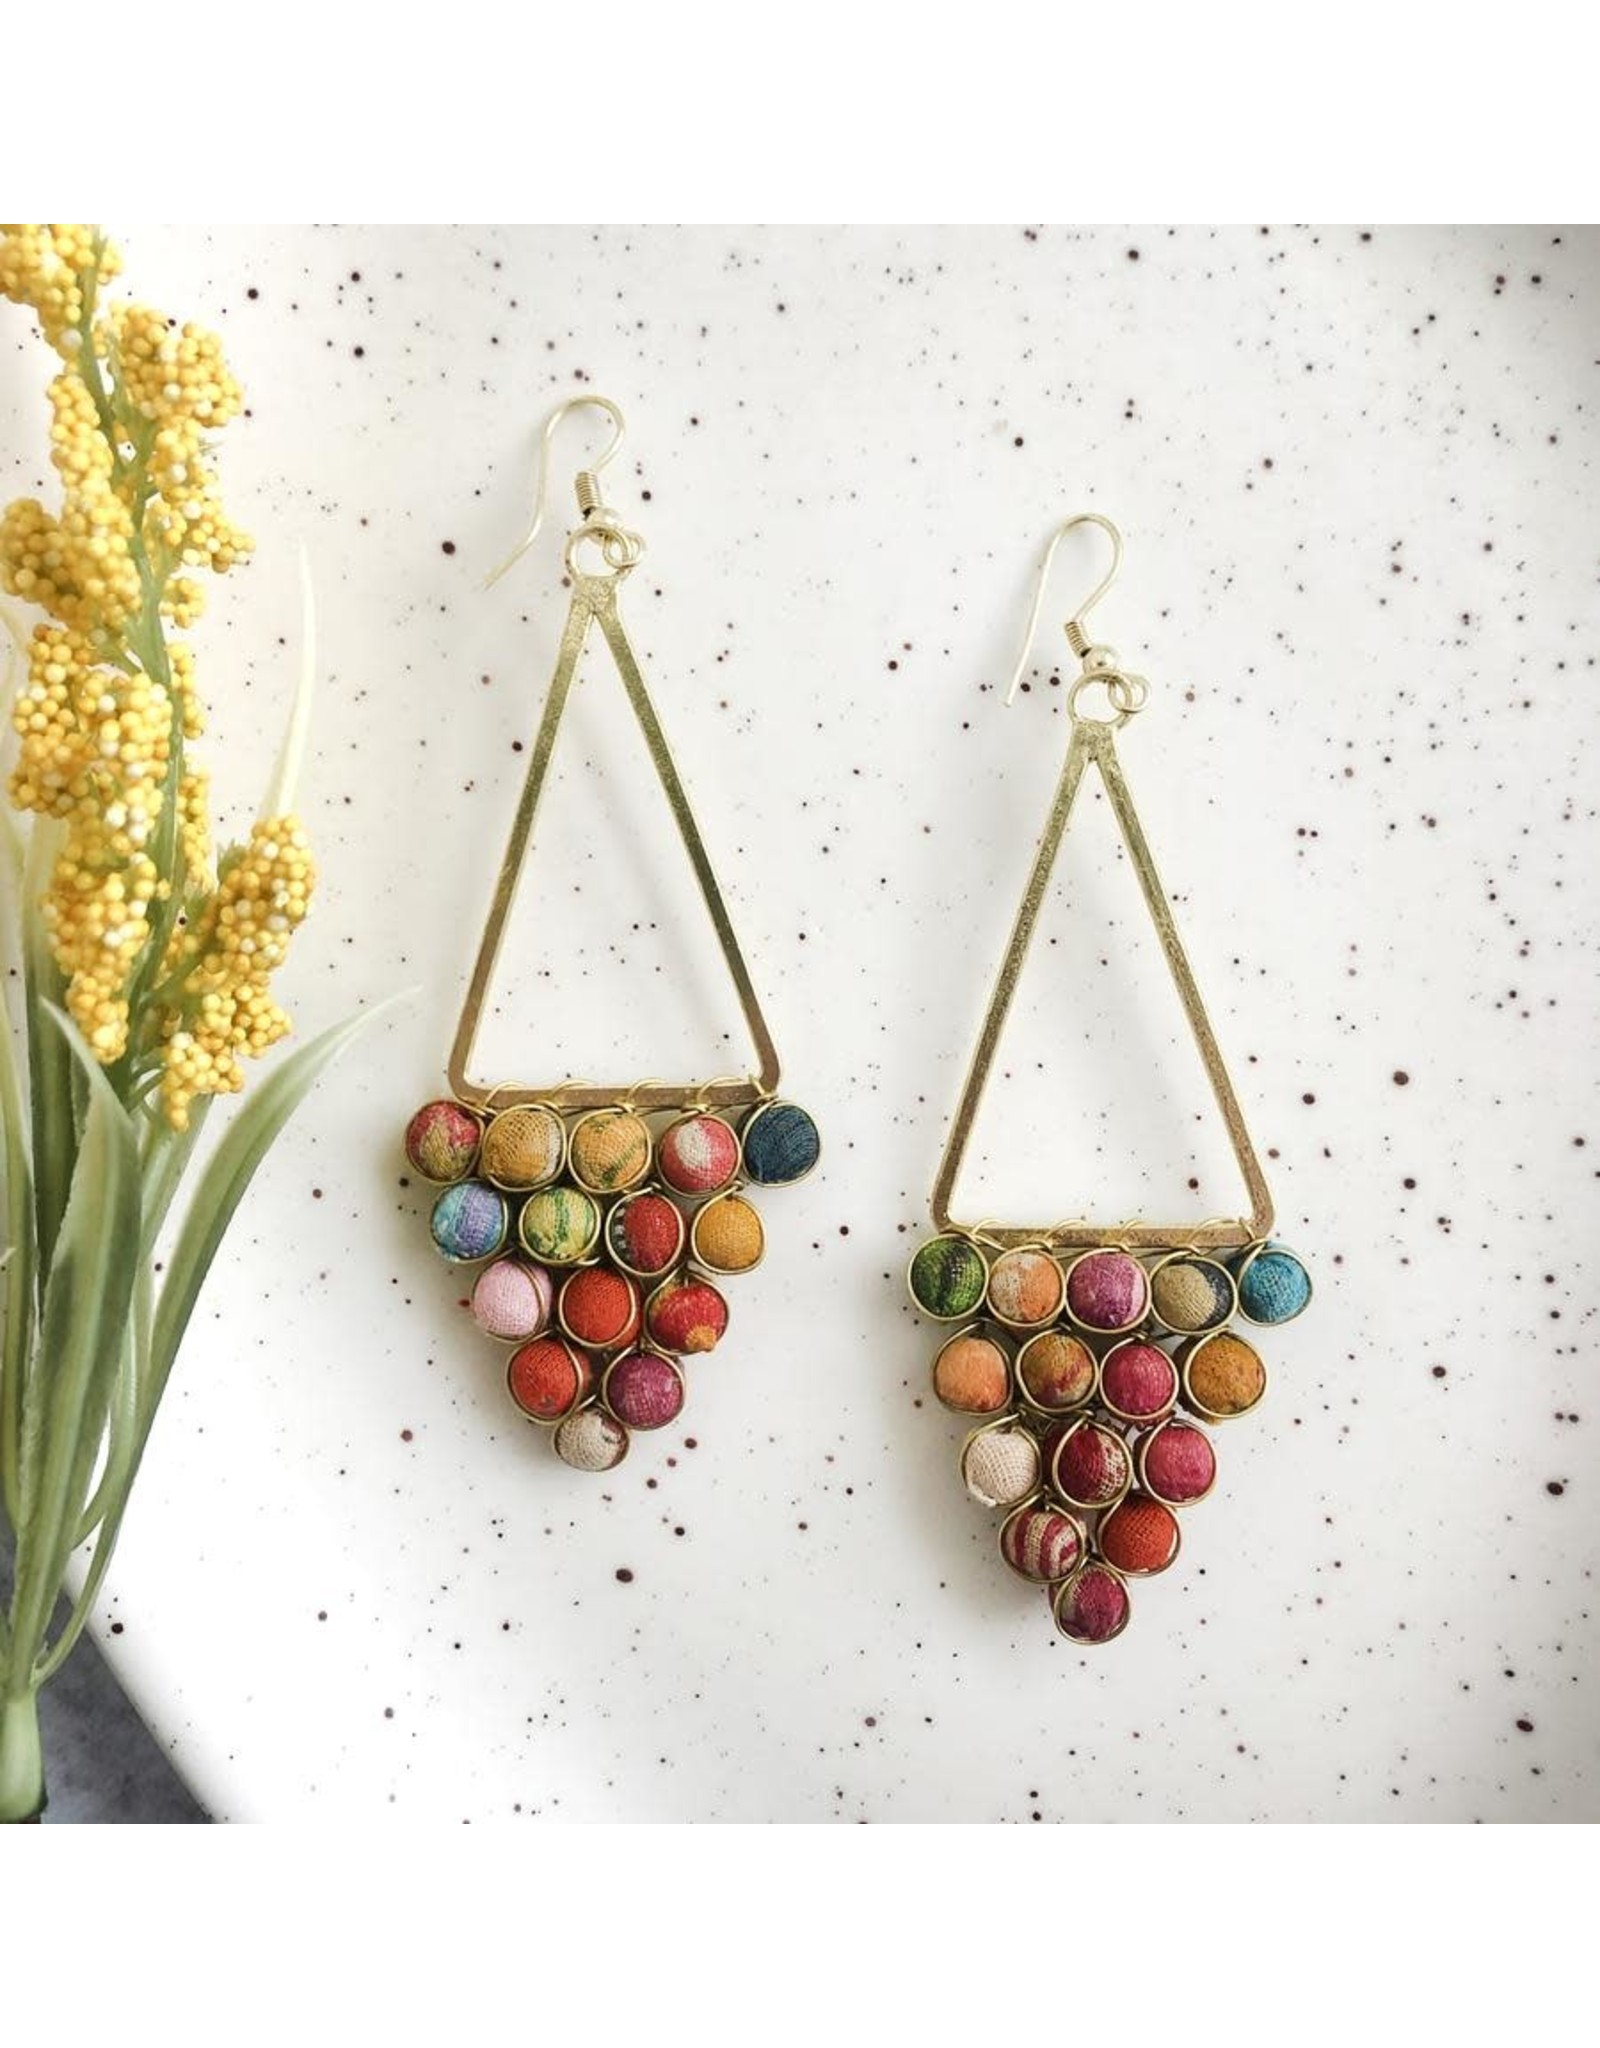 Kantha Reflective Chandelier Earrings, India